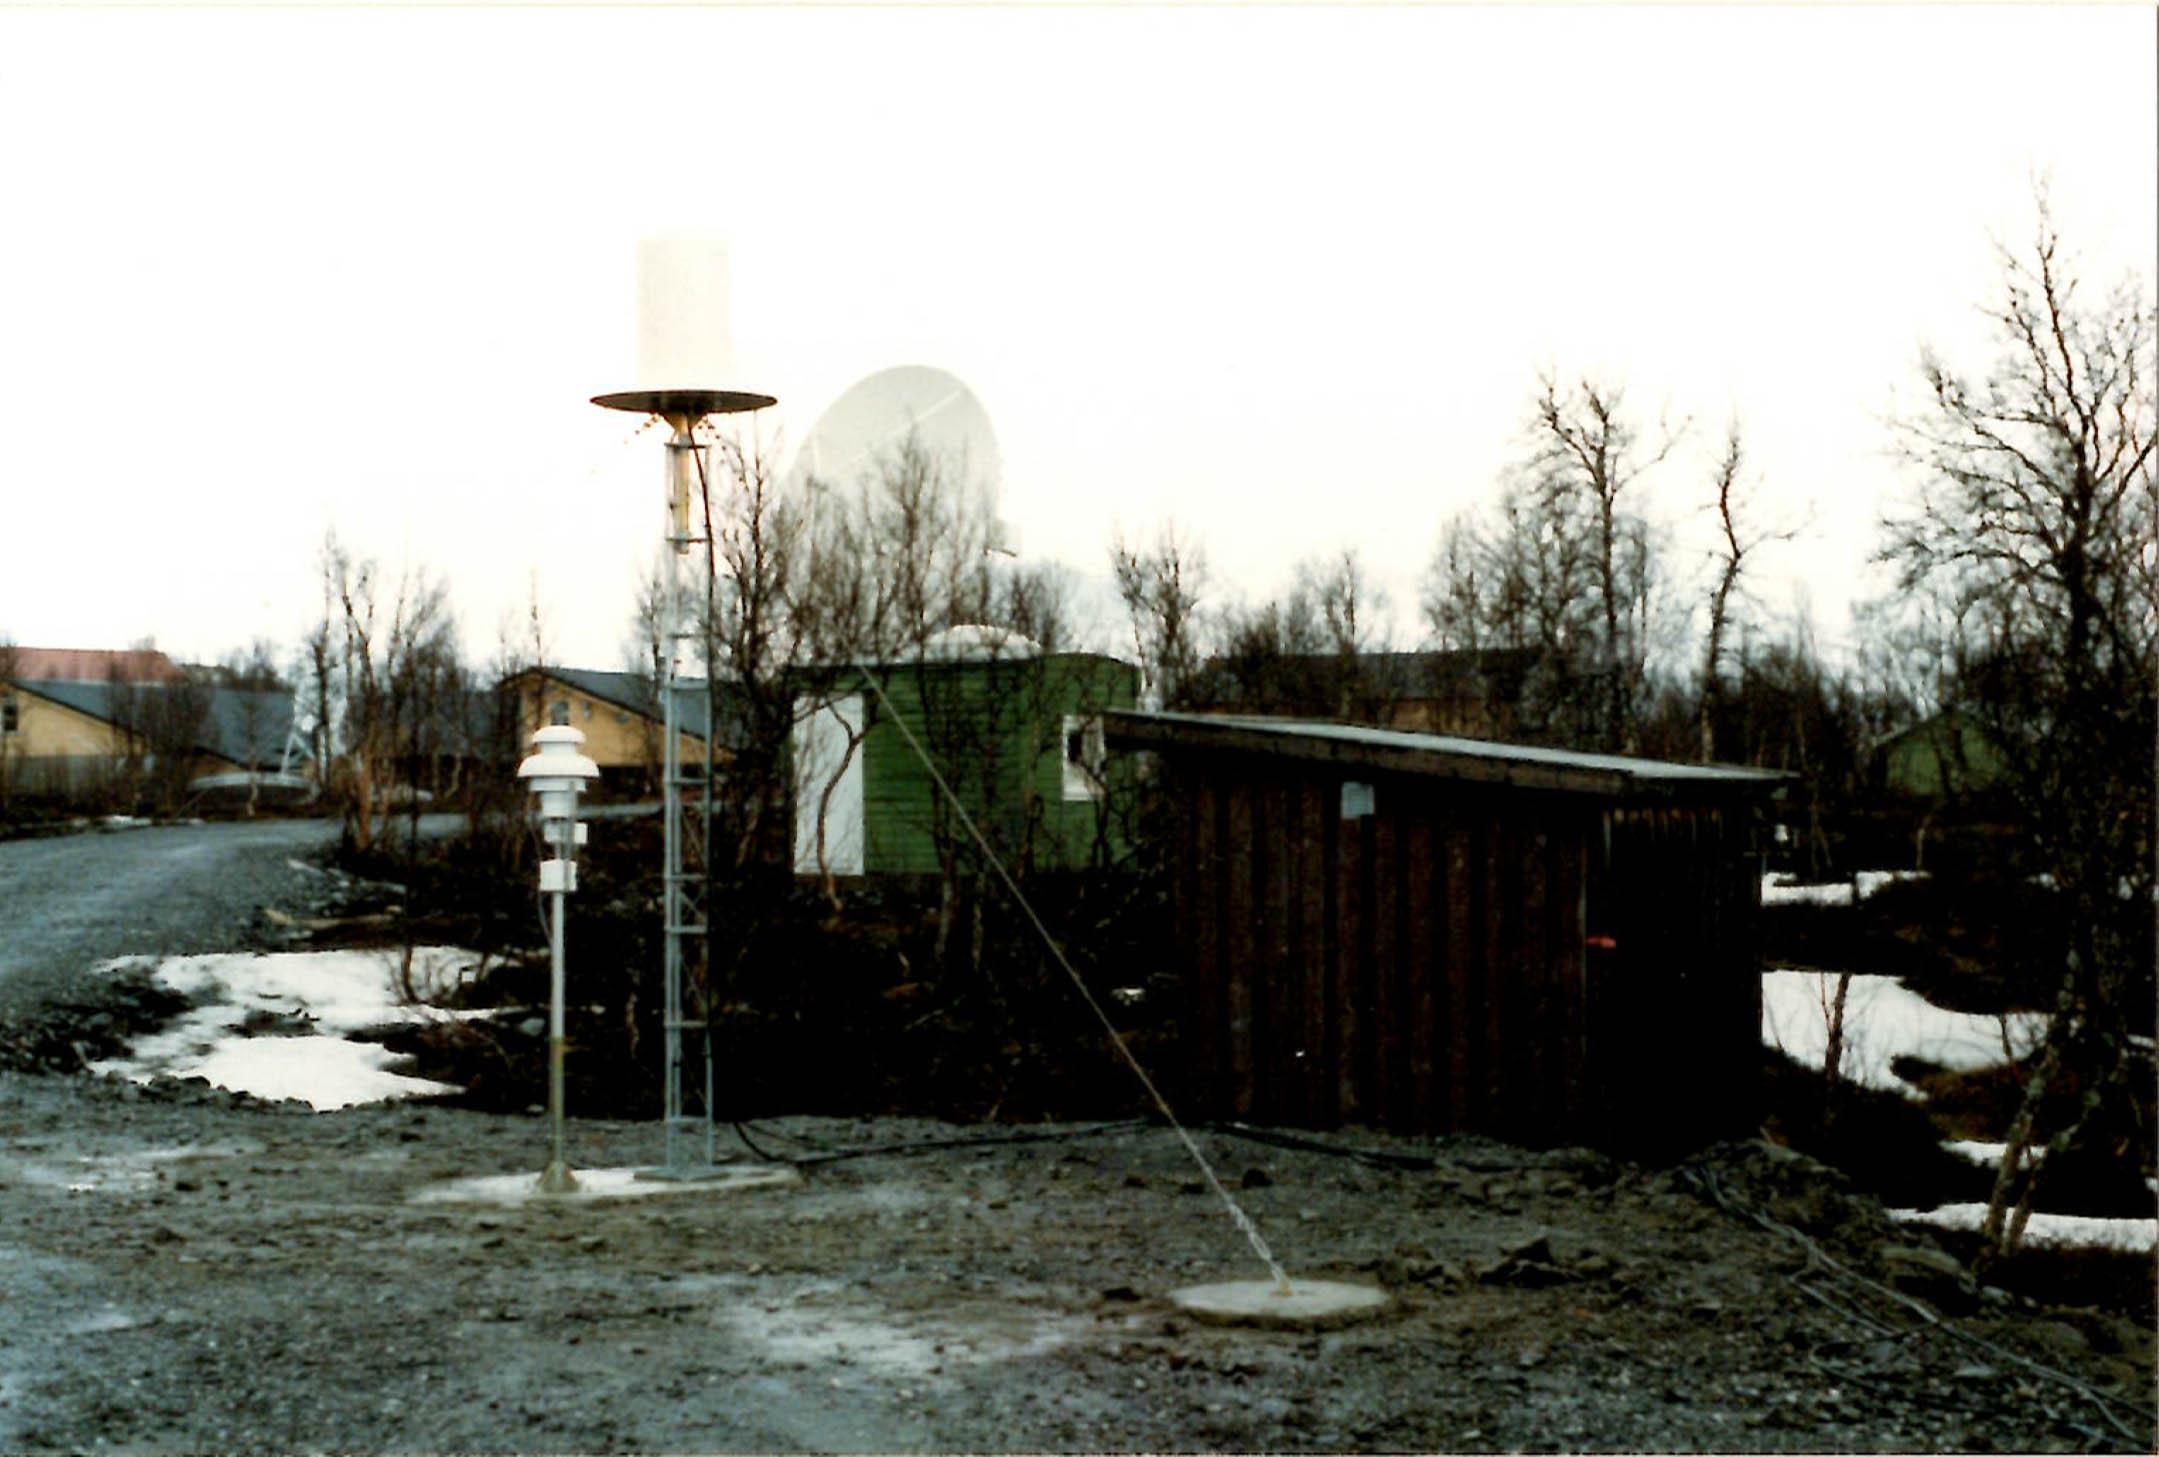 DORIS station: TROMSO - NORWAY